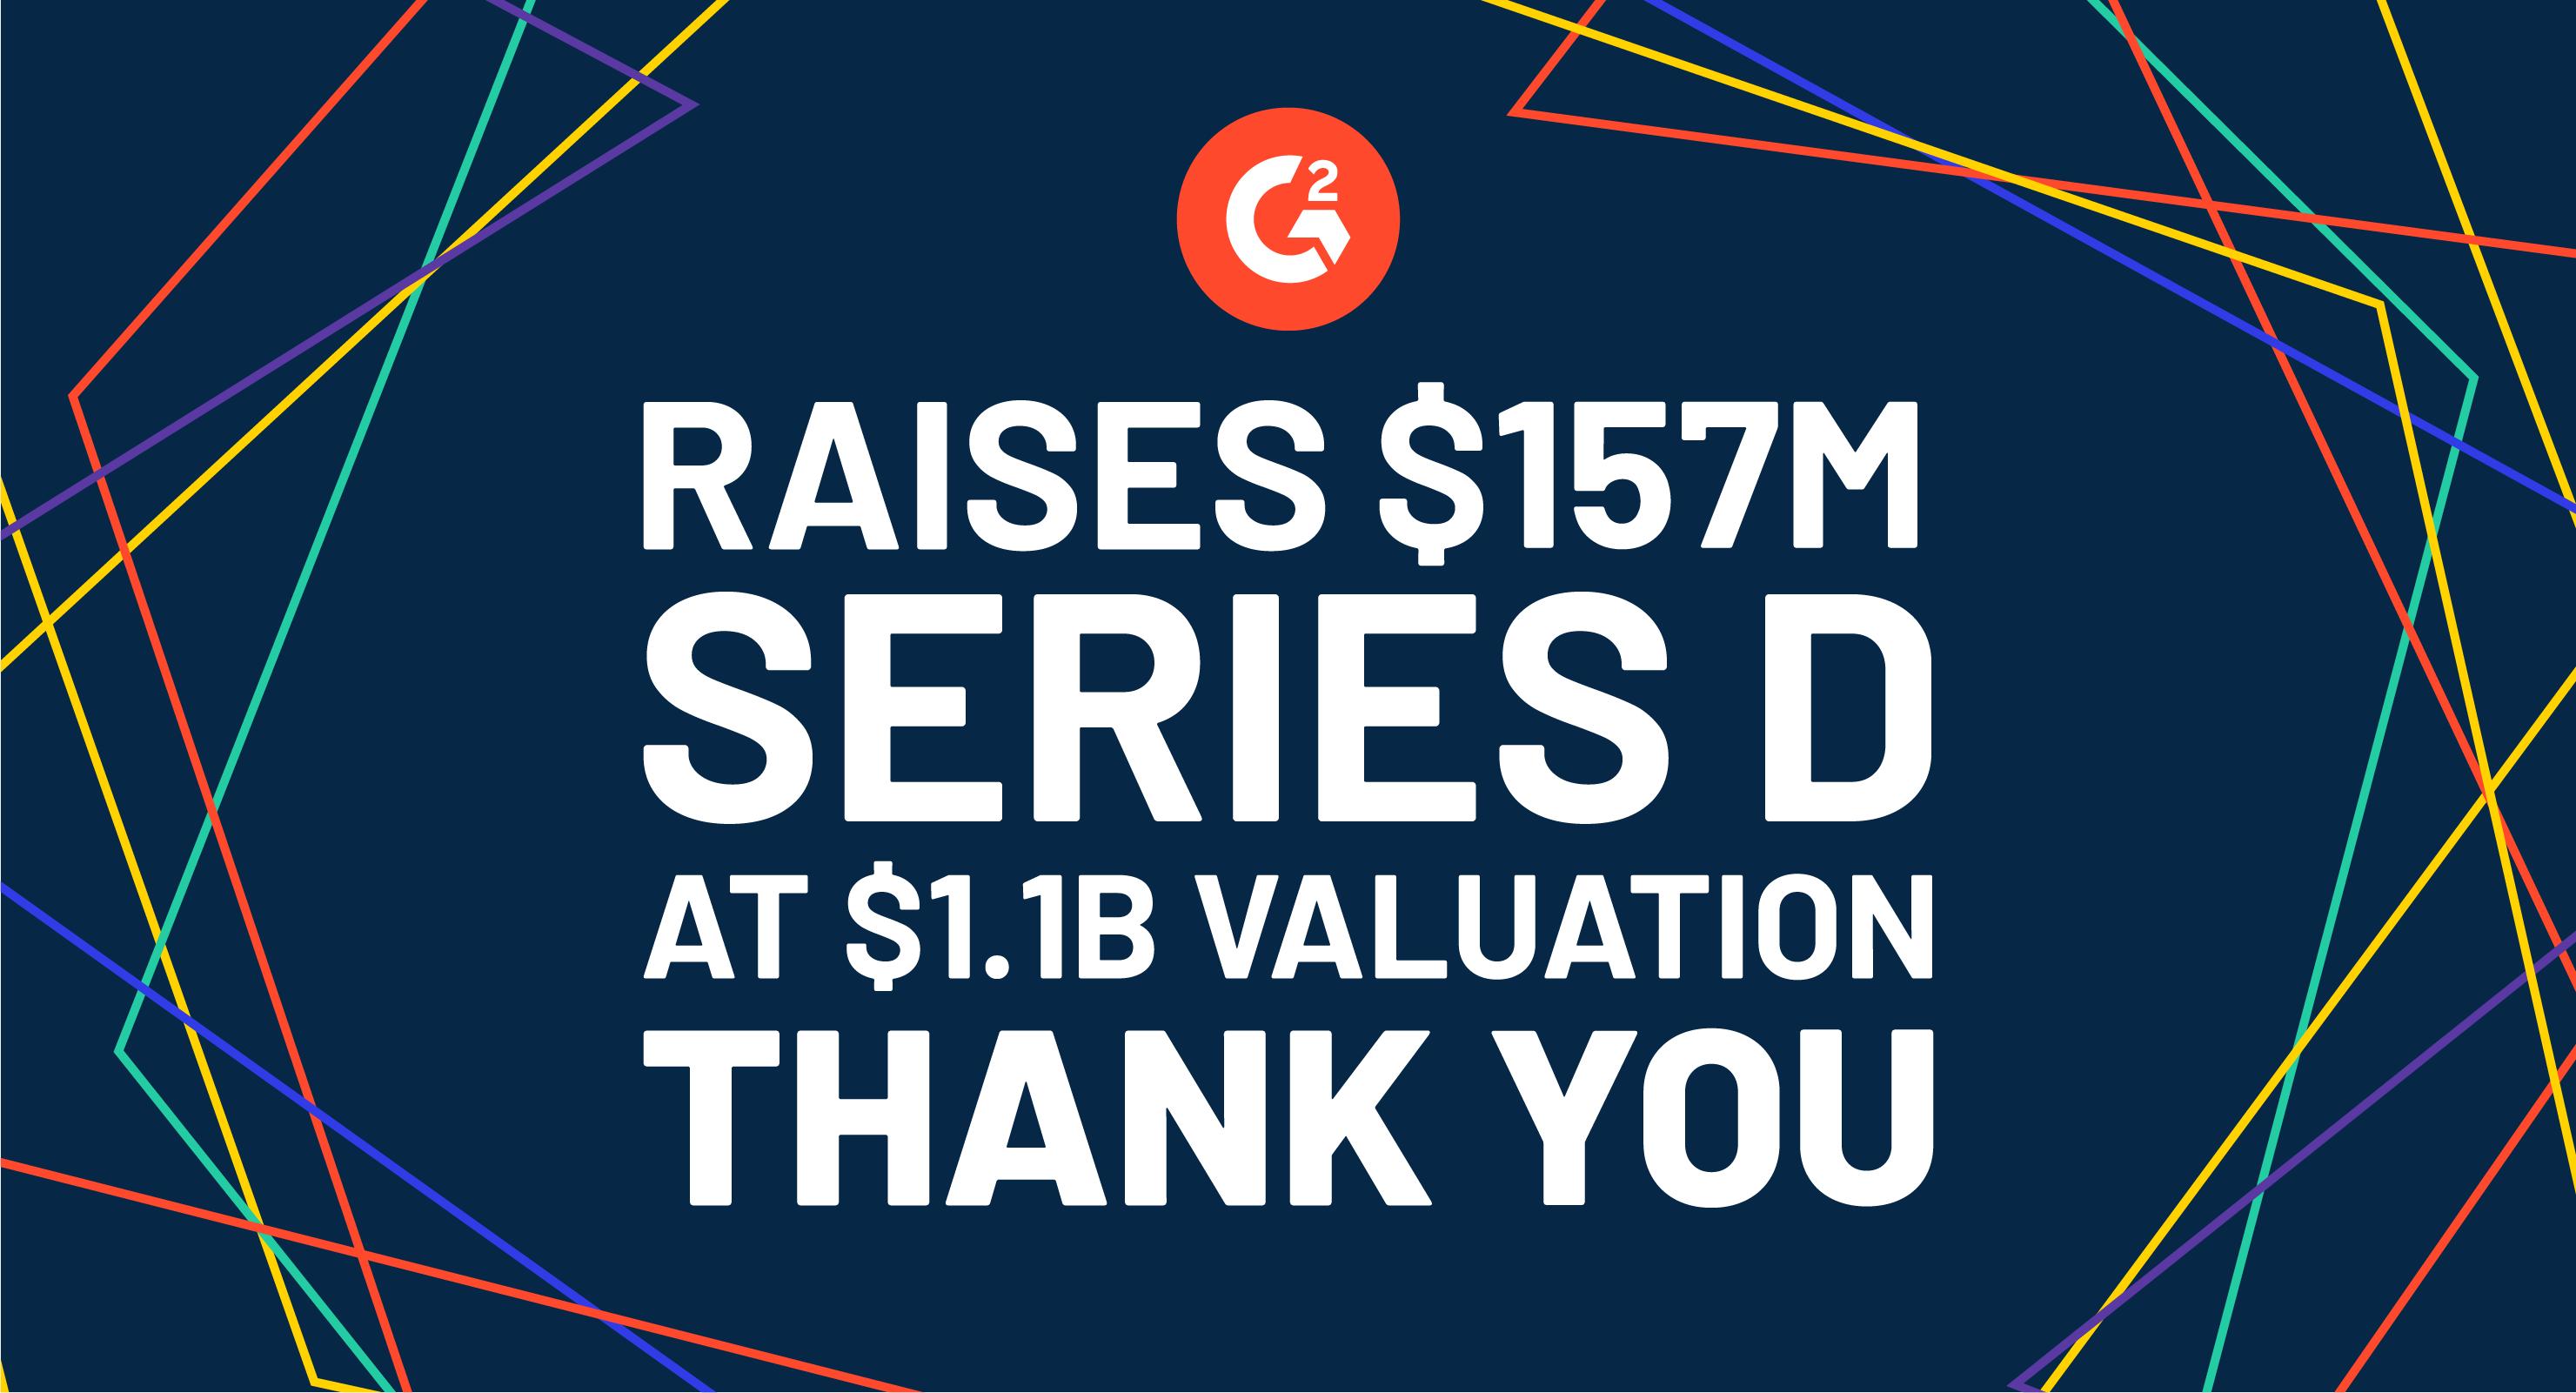 G2 Raises $157M at a $1.1B Valuation